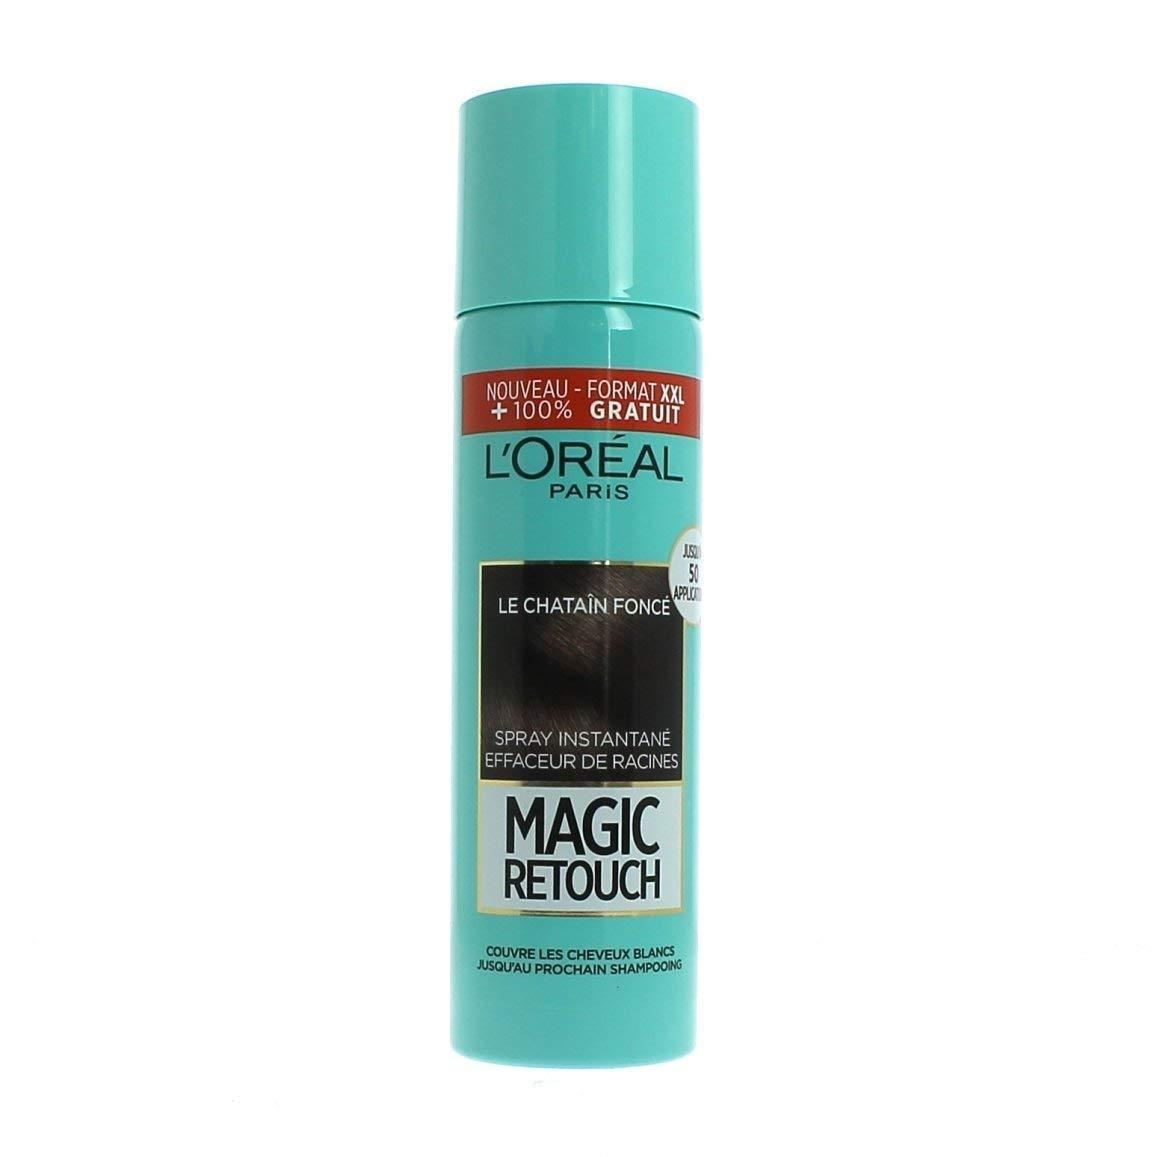 MAXI FORMATO!!Magic Retouch effaceur di radice l' Oréal Paris CASTANO SCURO